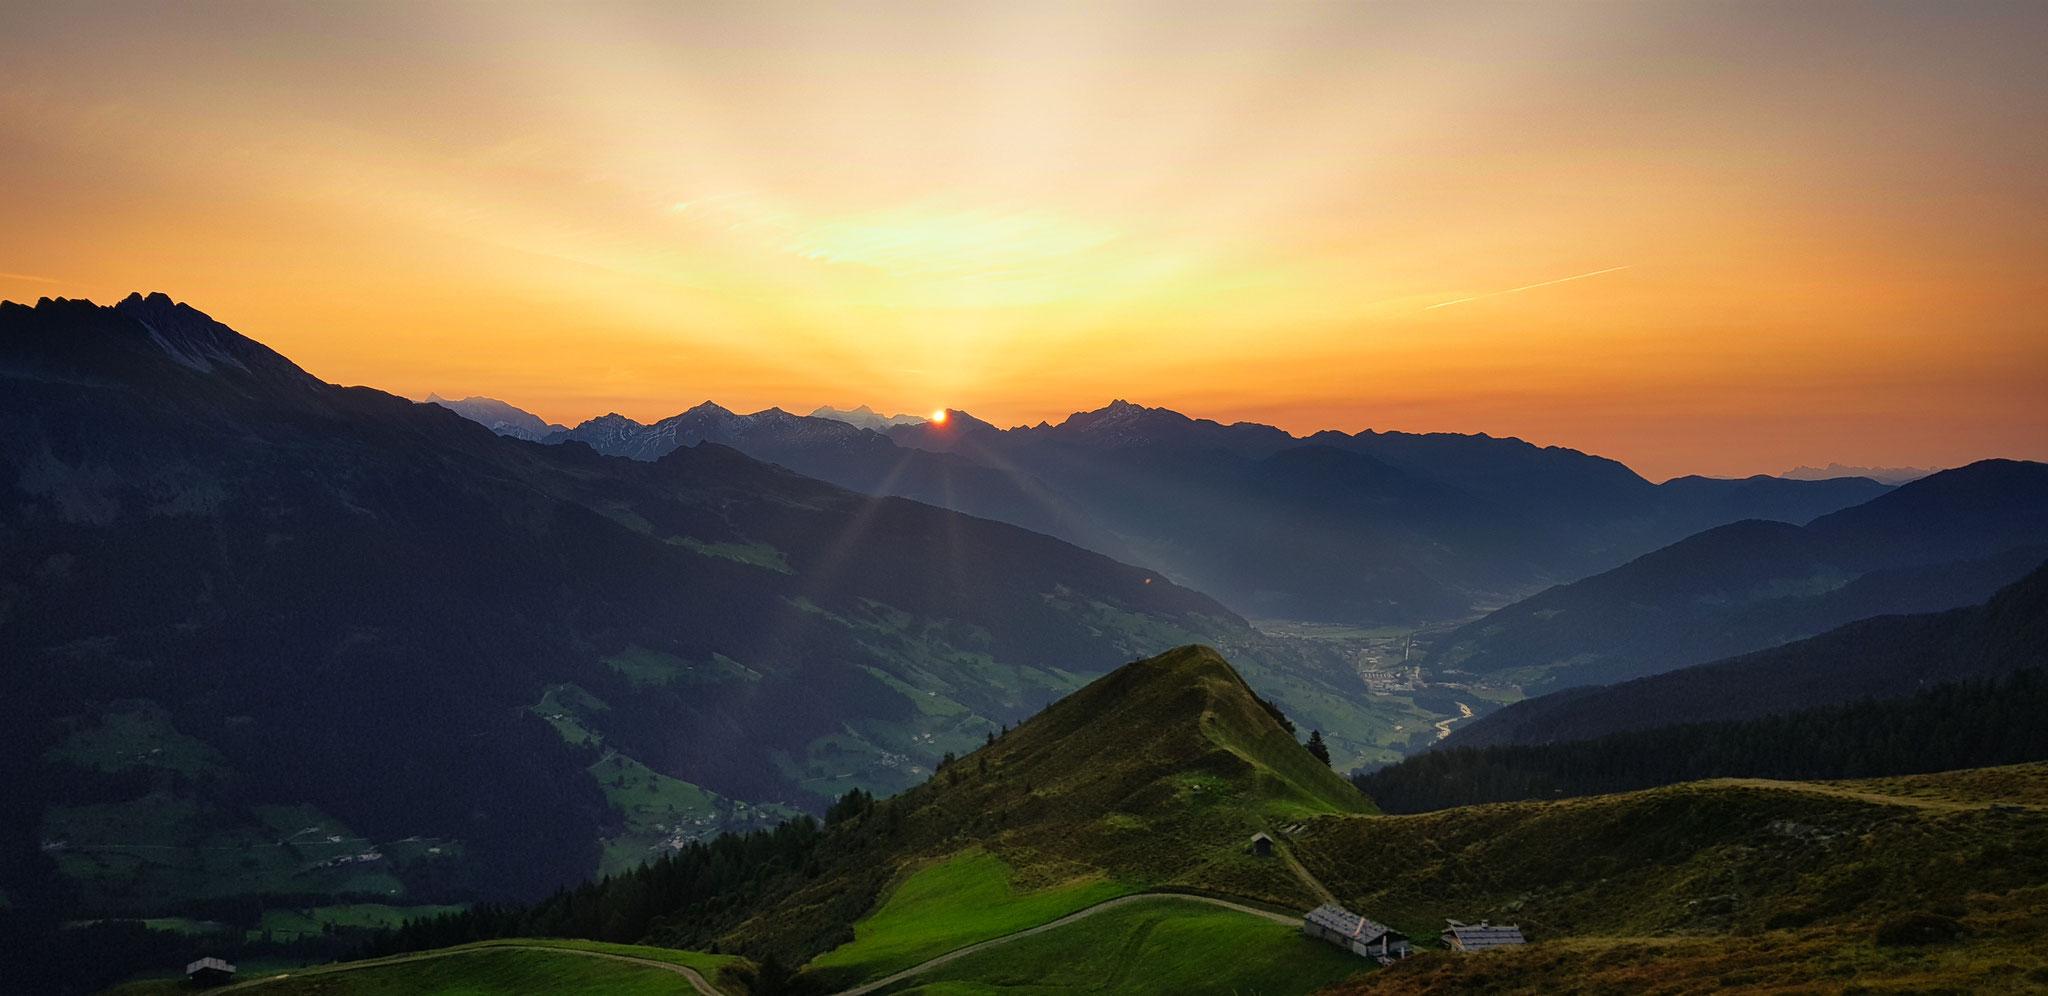 Sonnenaufgang Joggelealm / Ridnauntal